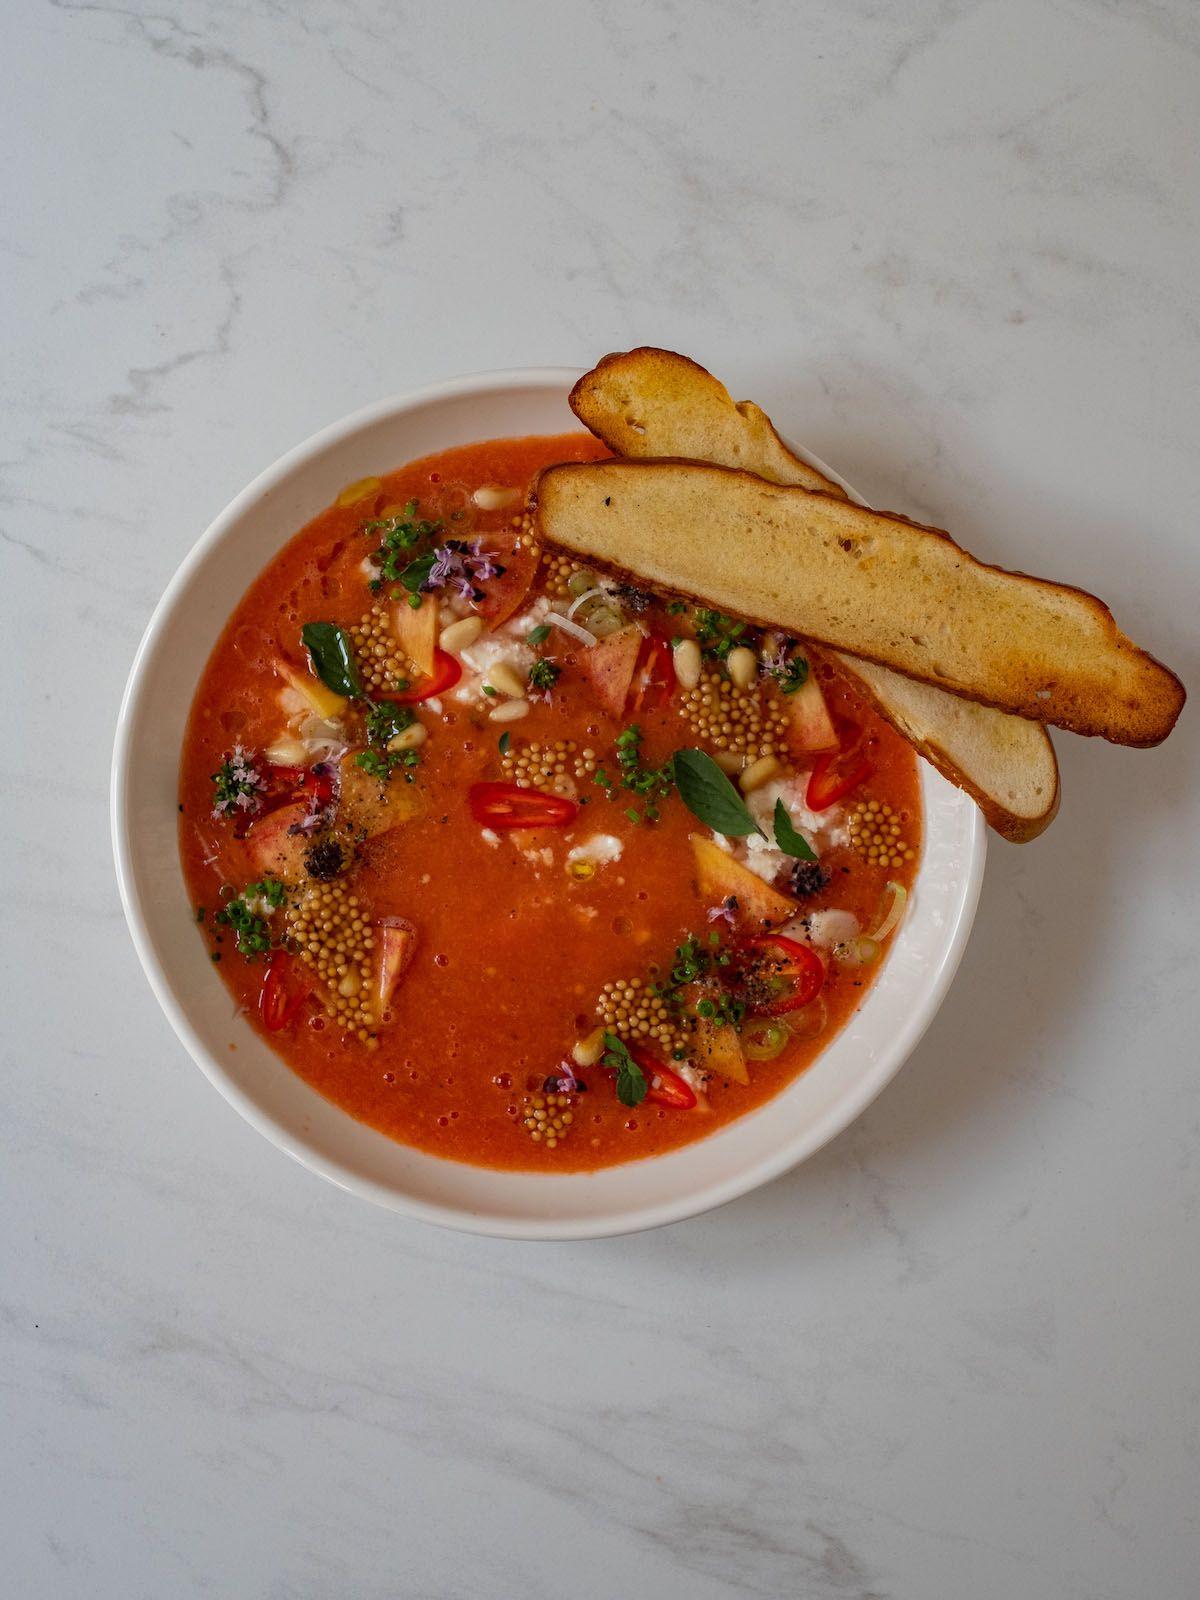 Rezept, Foodblog, Abput Fuel, Senfcaviar, Gazpacho, Senfsaat, Kräuter, Feta